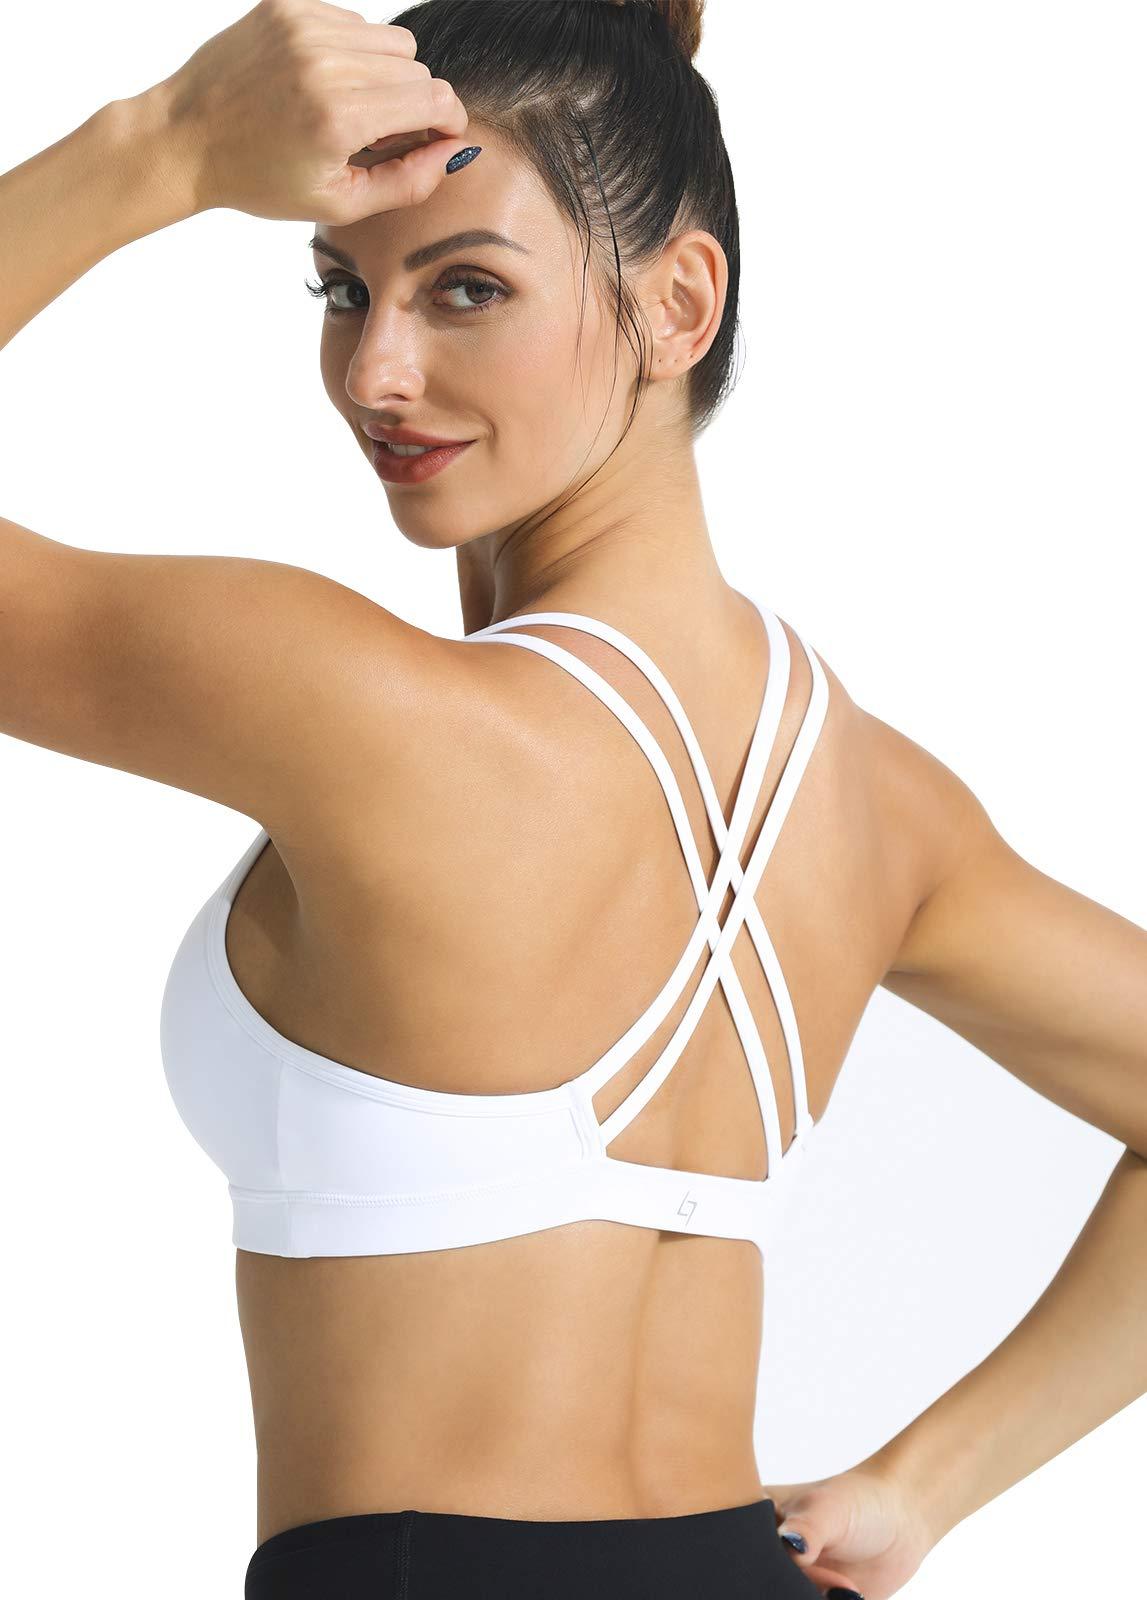 FITTIN Strappy Sports Bra - Crisscross Back Sports Bras for Women Wirefree Bra for Workout Yoga Tops